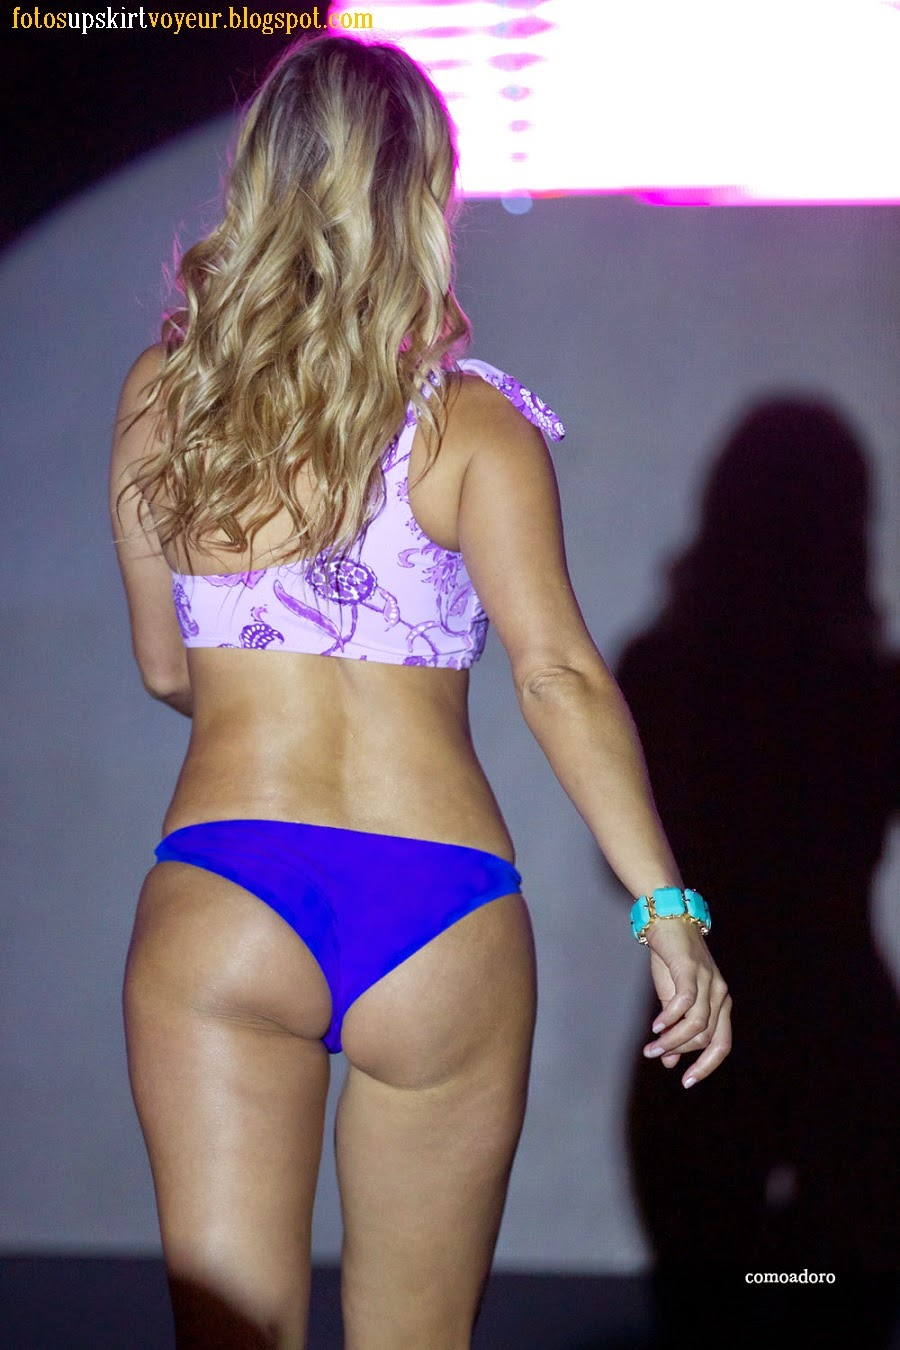 Culo caliente bikini mujeres